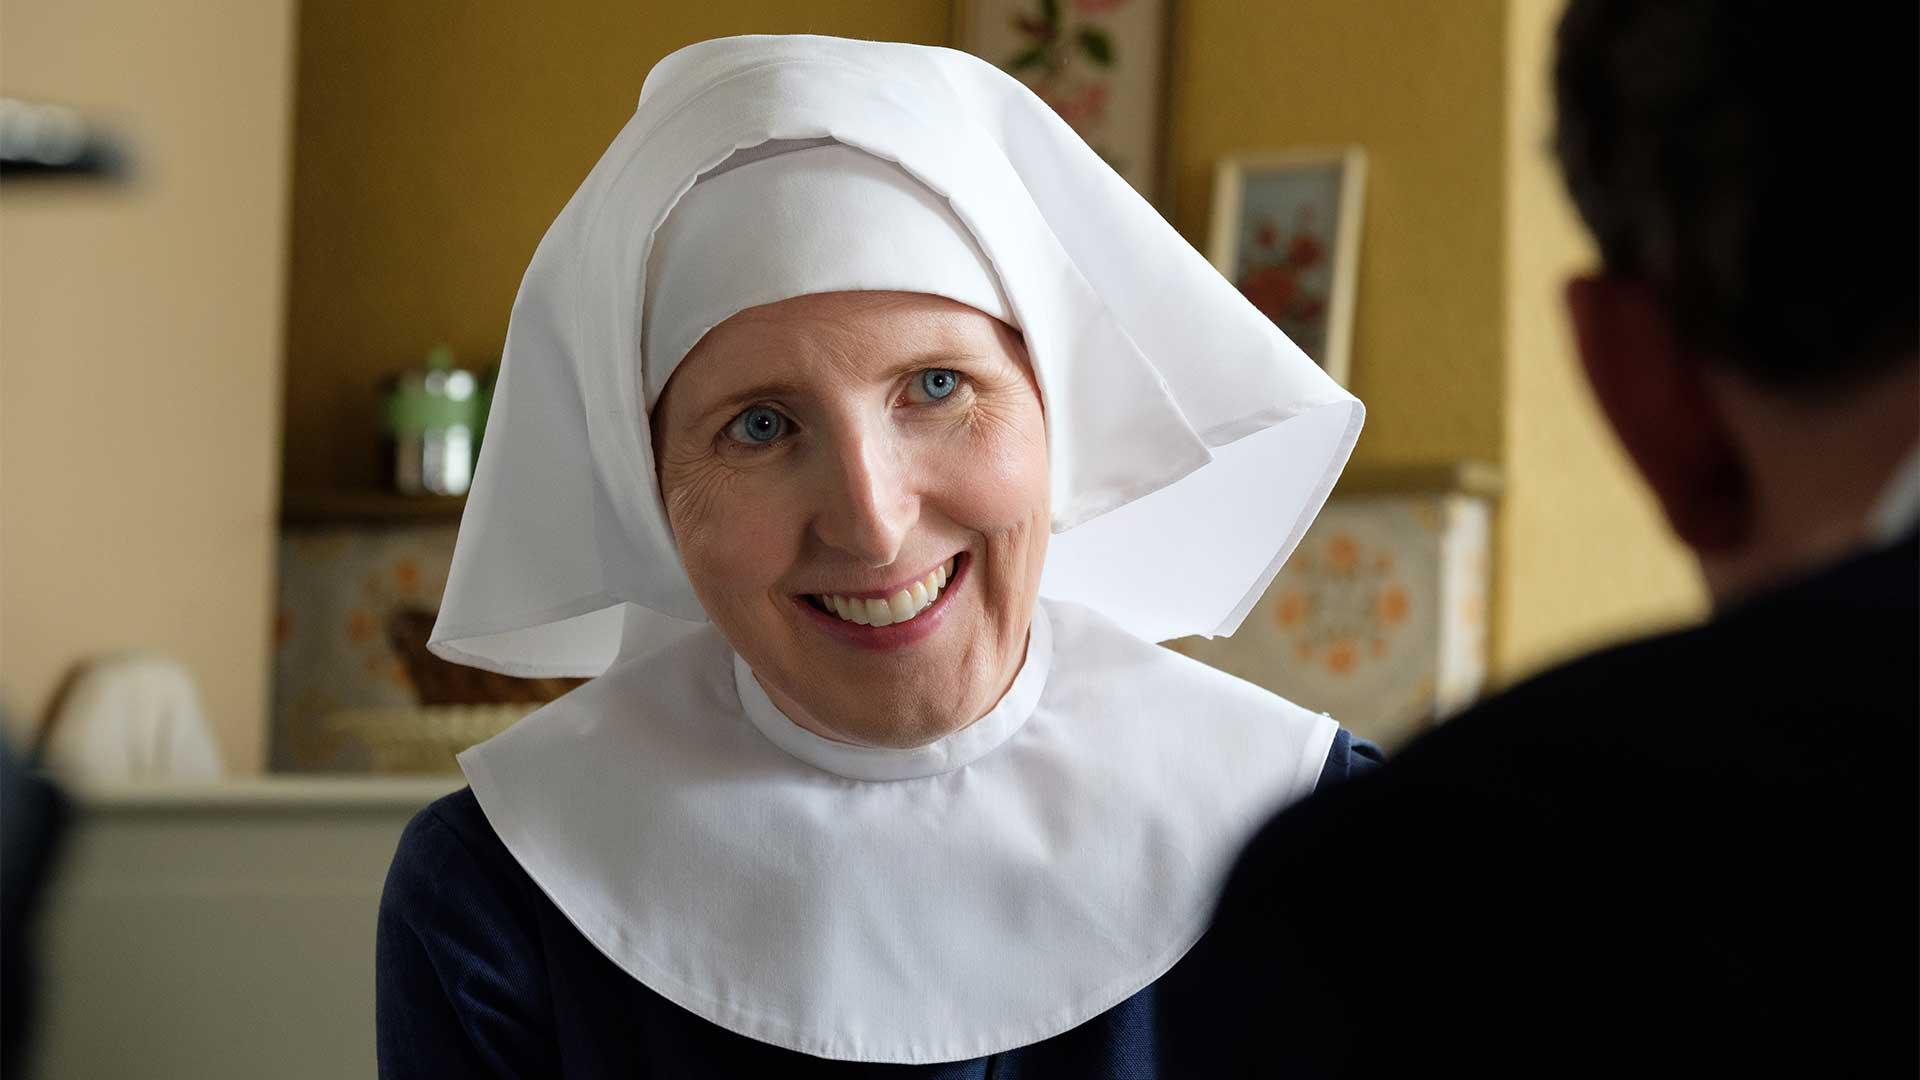 Fenella Woolgar plays Sister Hilda